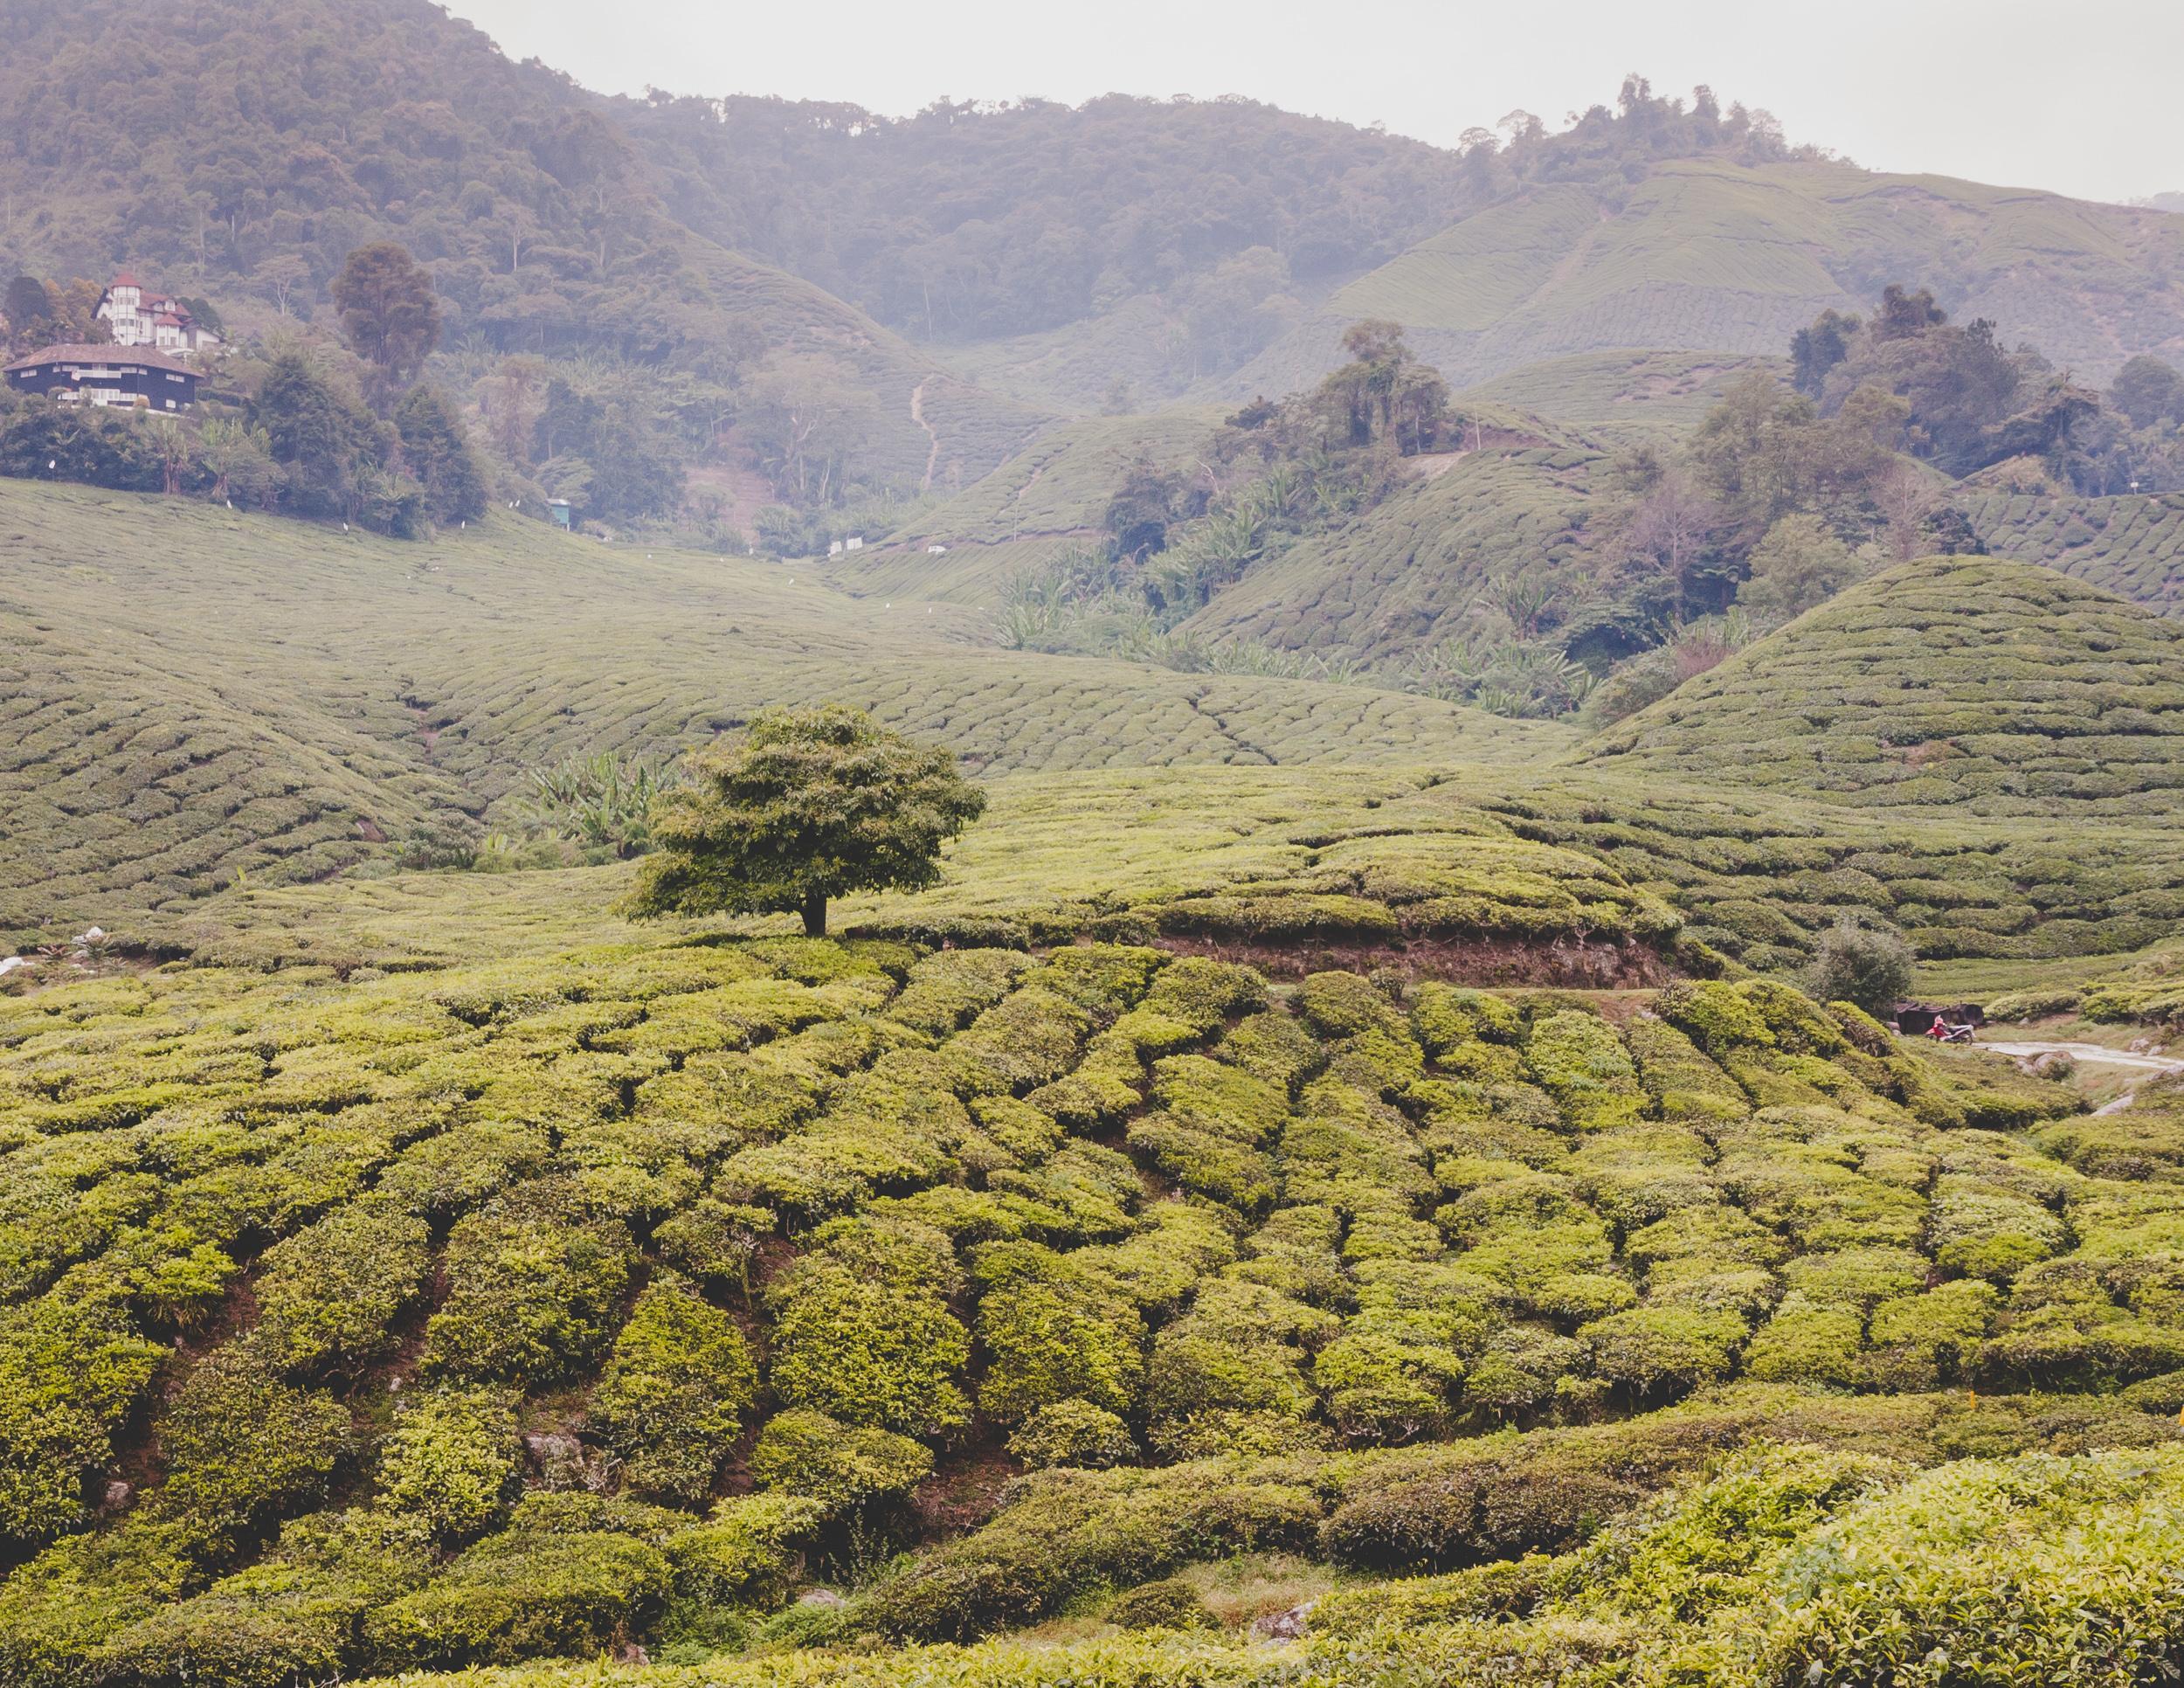 Boh Tea Plantation, Cameron Highlands, Malaysia